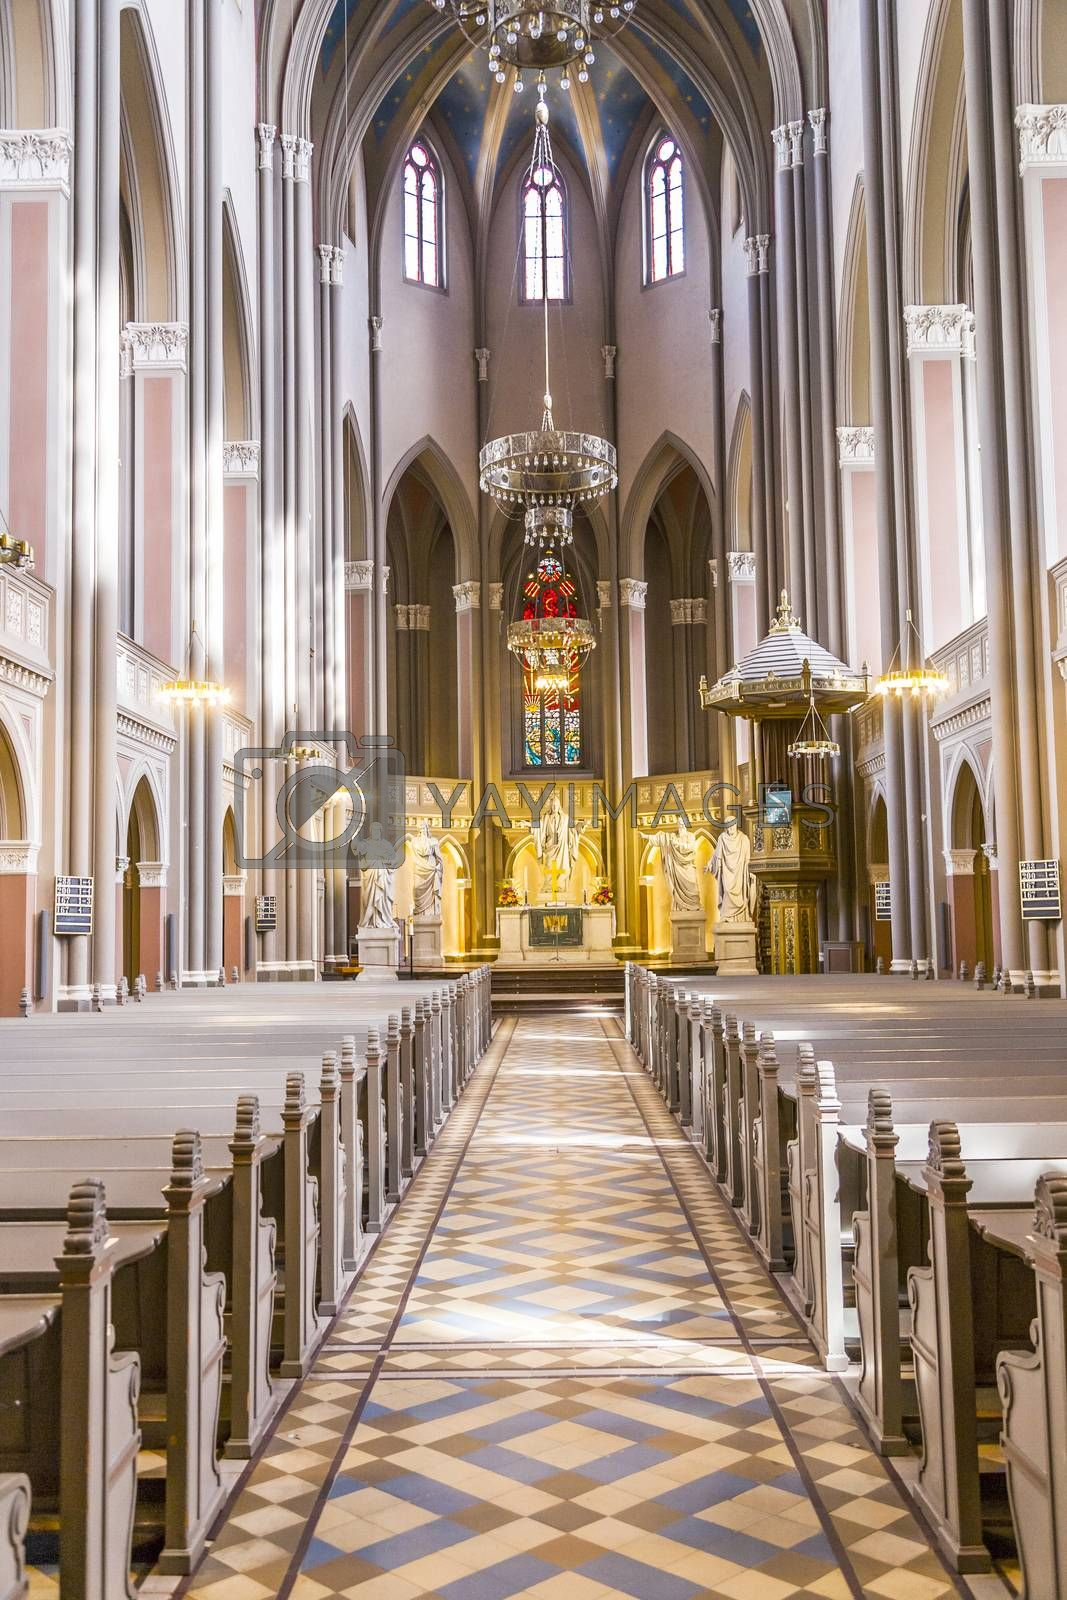 inside the Marktkirche by meinzahn